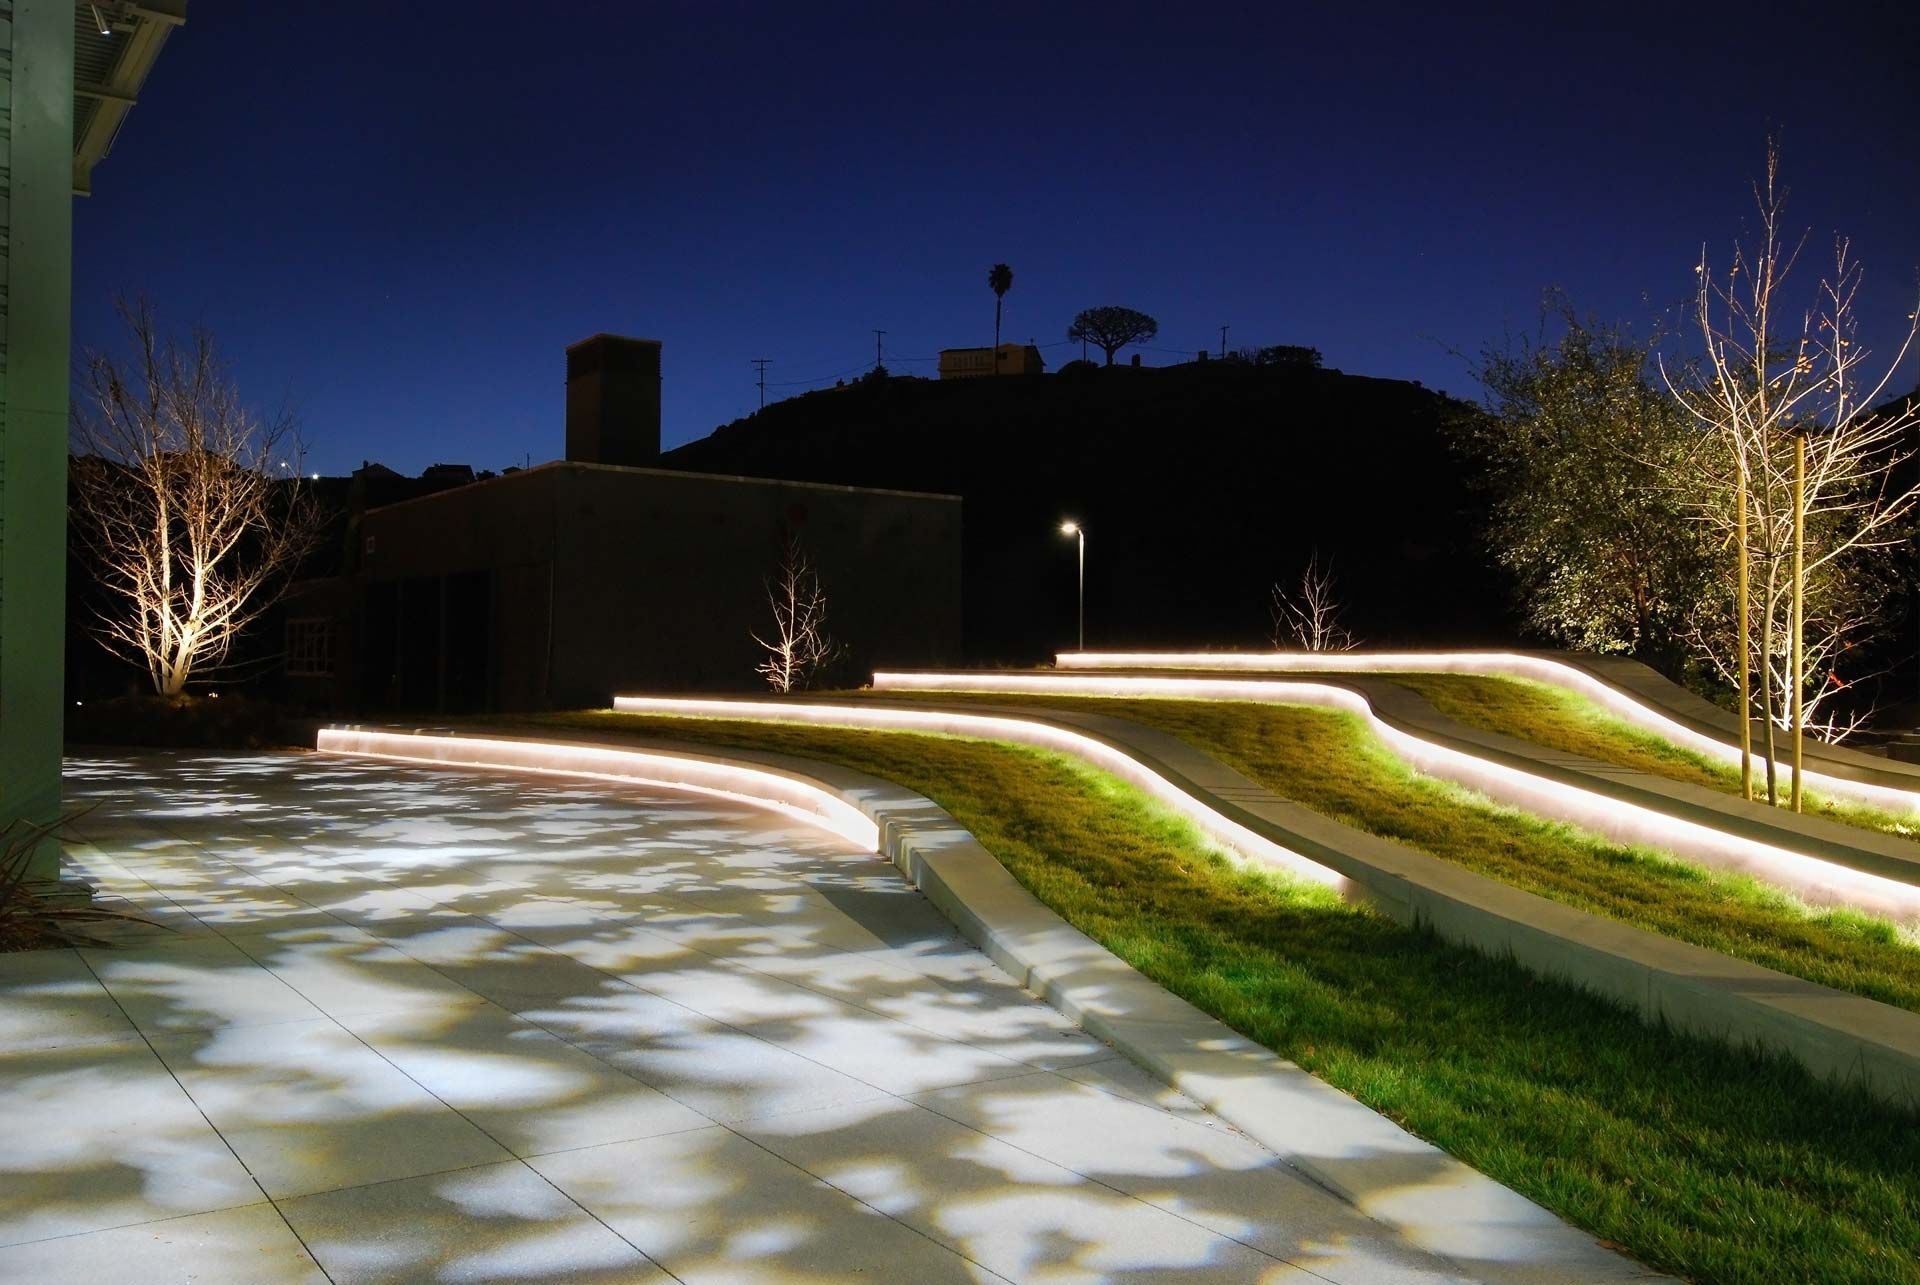 Designing A Moonlit Theater For Youtube Oculus Light Studio Landscape Lighting Design Landscape Lighting Landscape Design